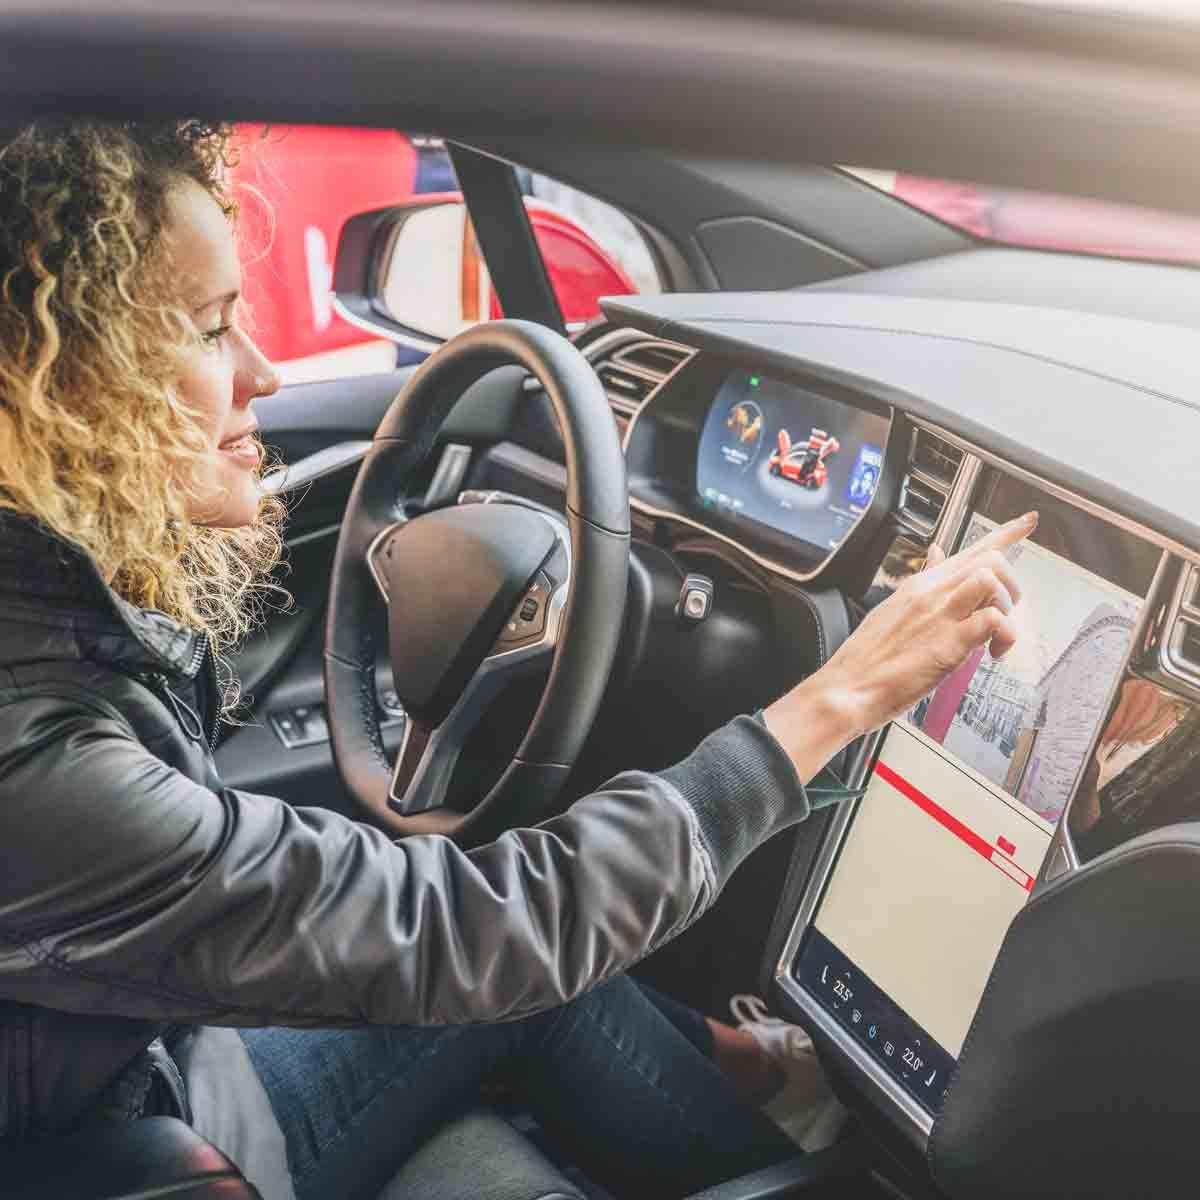 Woman-using-car-computer